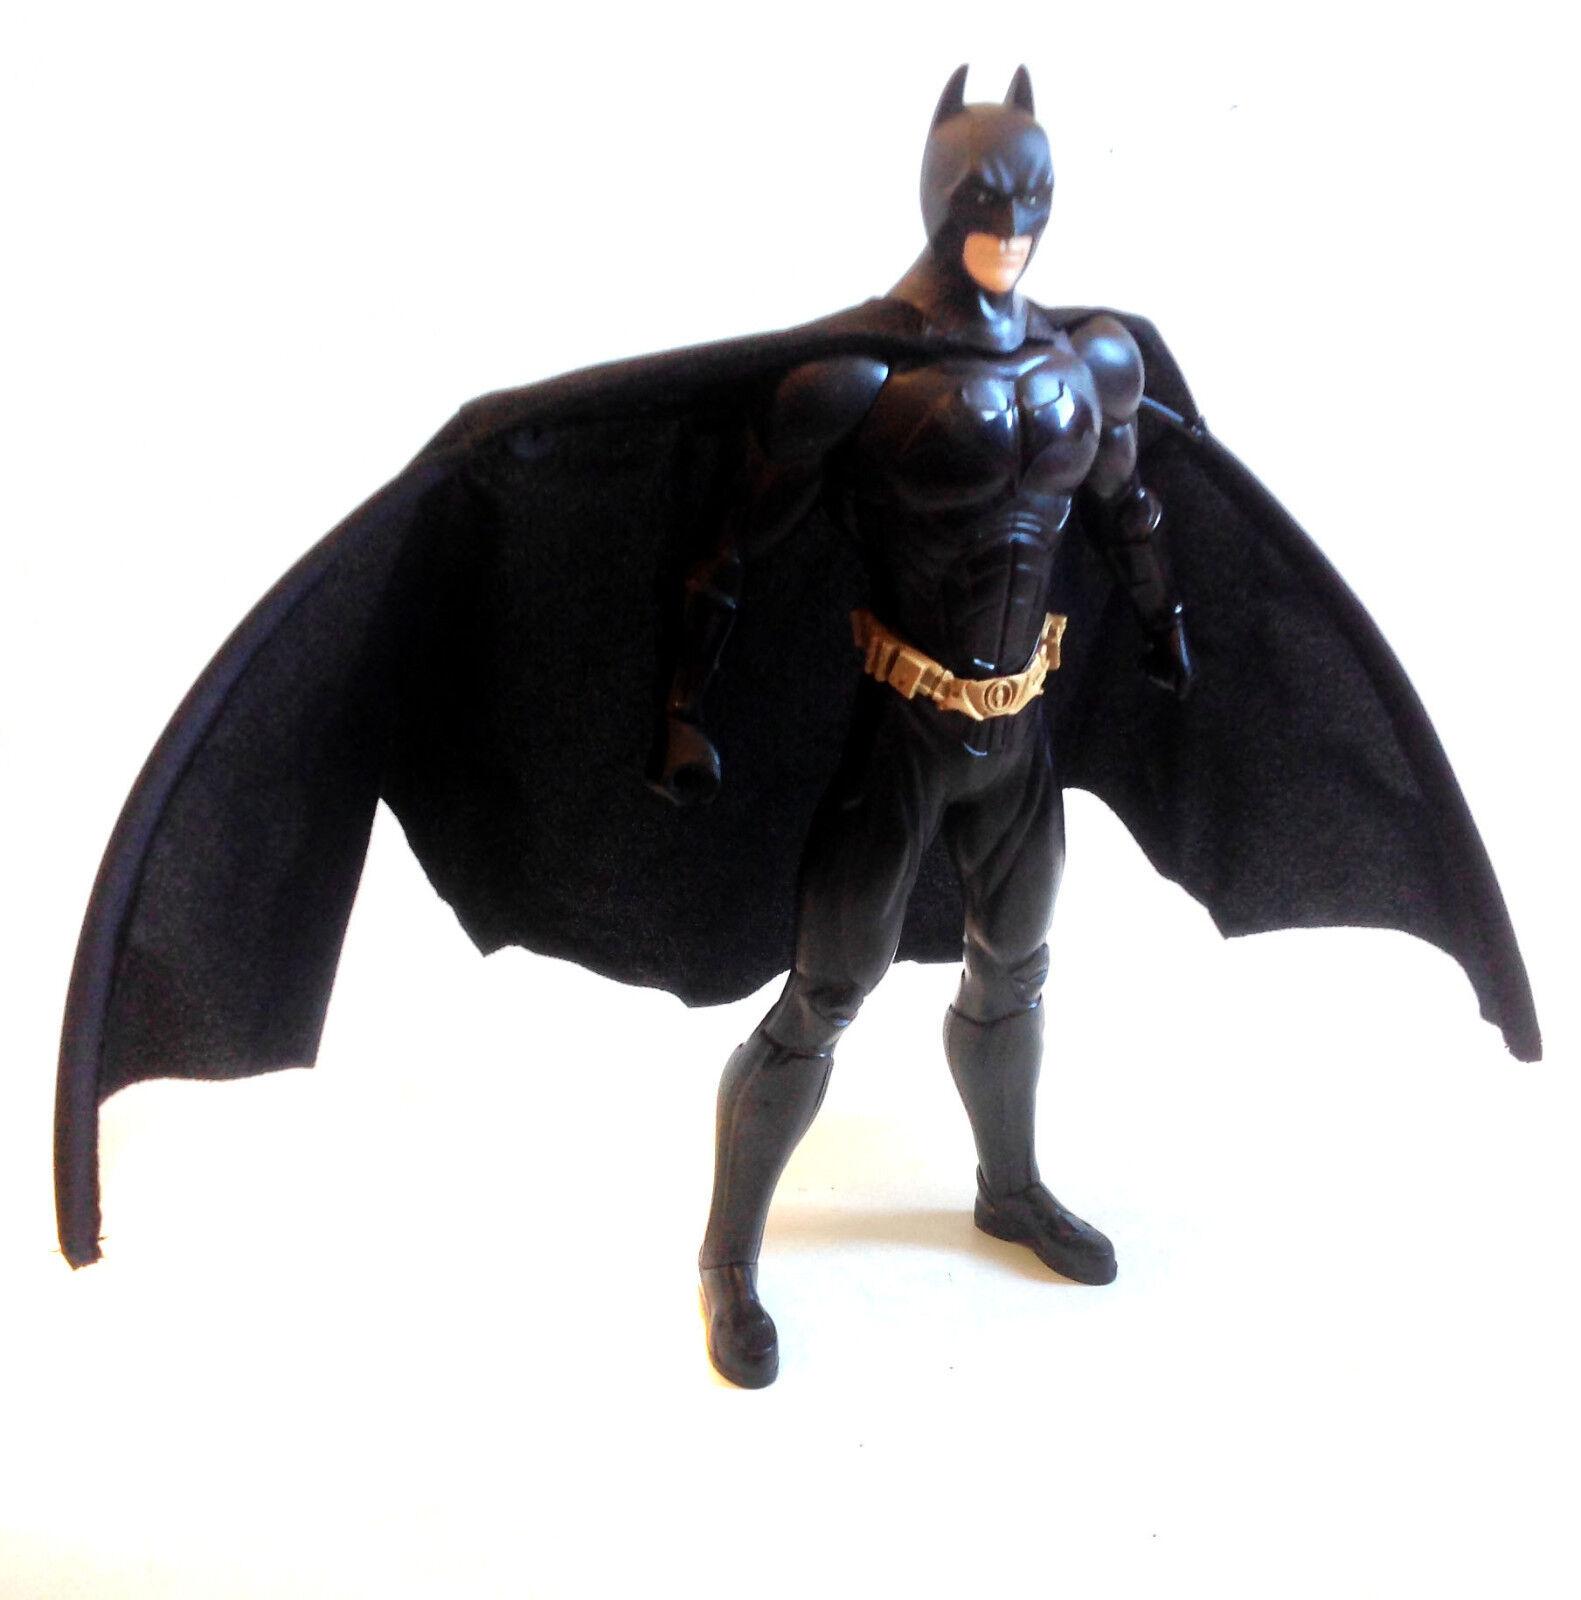 DC Comics BATMAN Big Big Big 12  Tall Toy figure with Glider Cape Action VERY COOL  e7d657